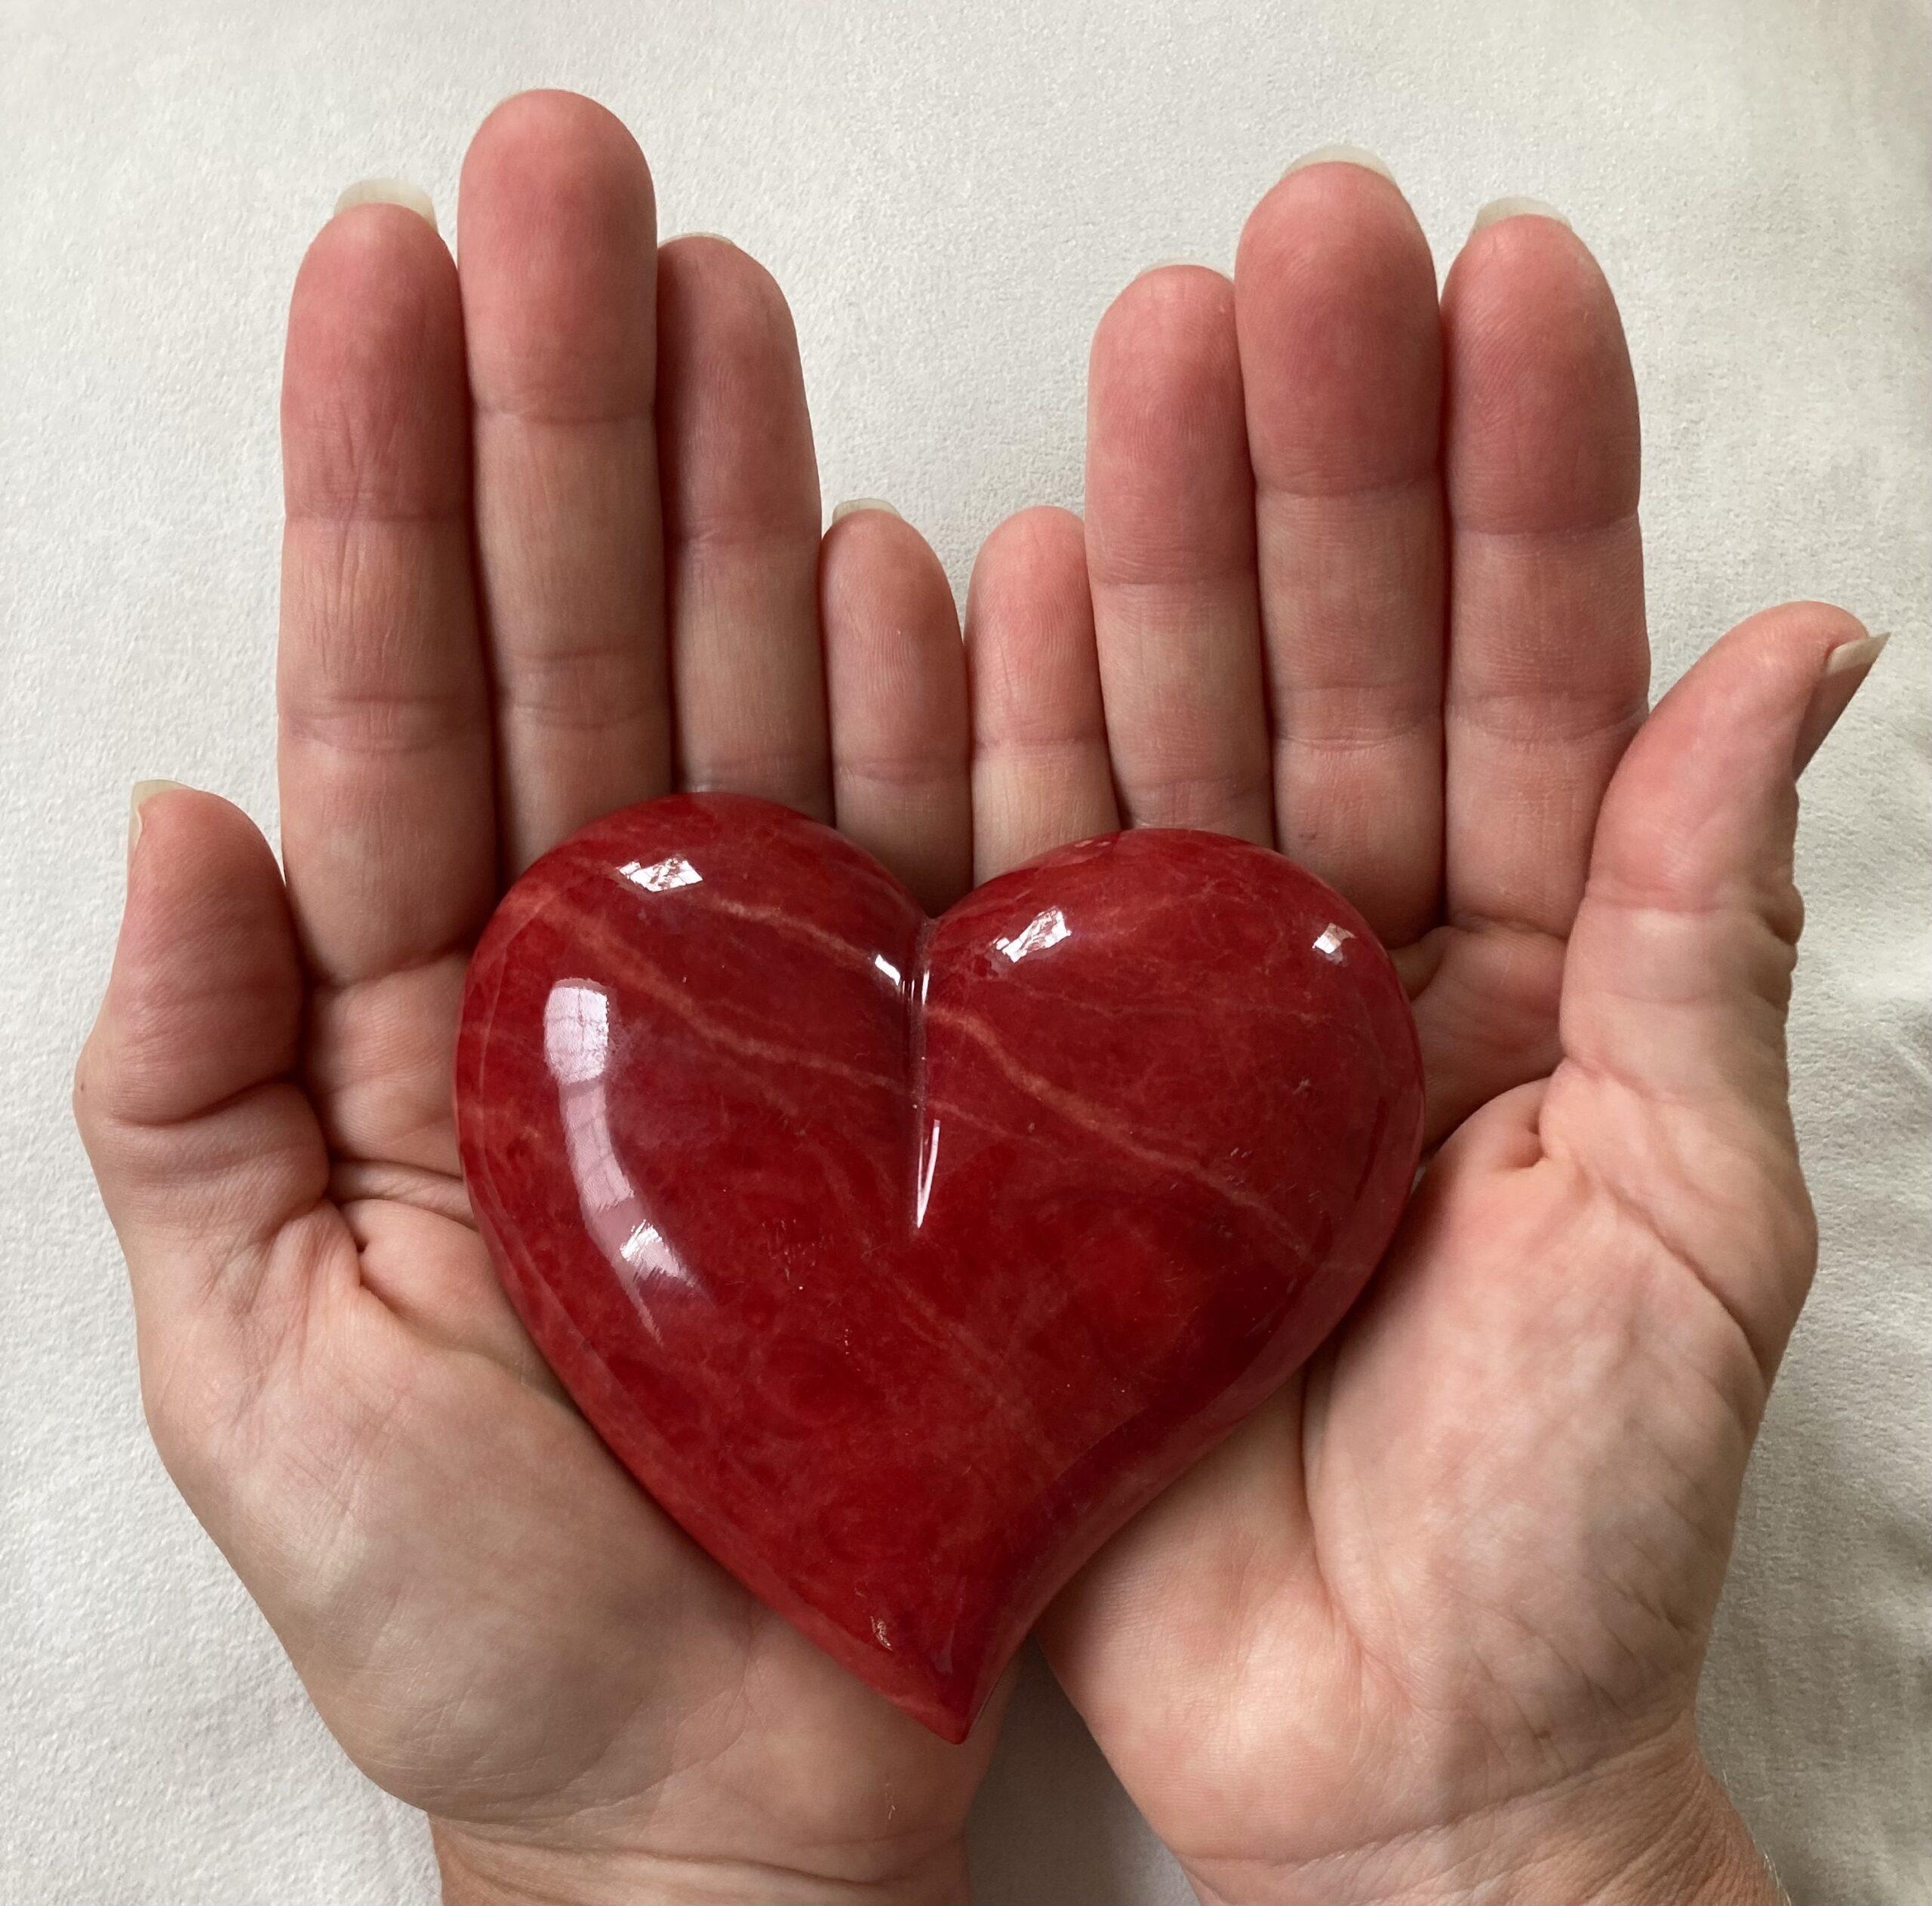 52 Days Reading One's Heart — A Tribute to Spirit Wisdom